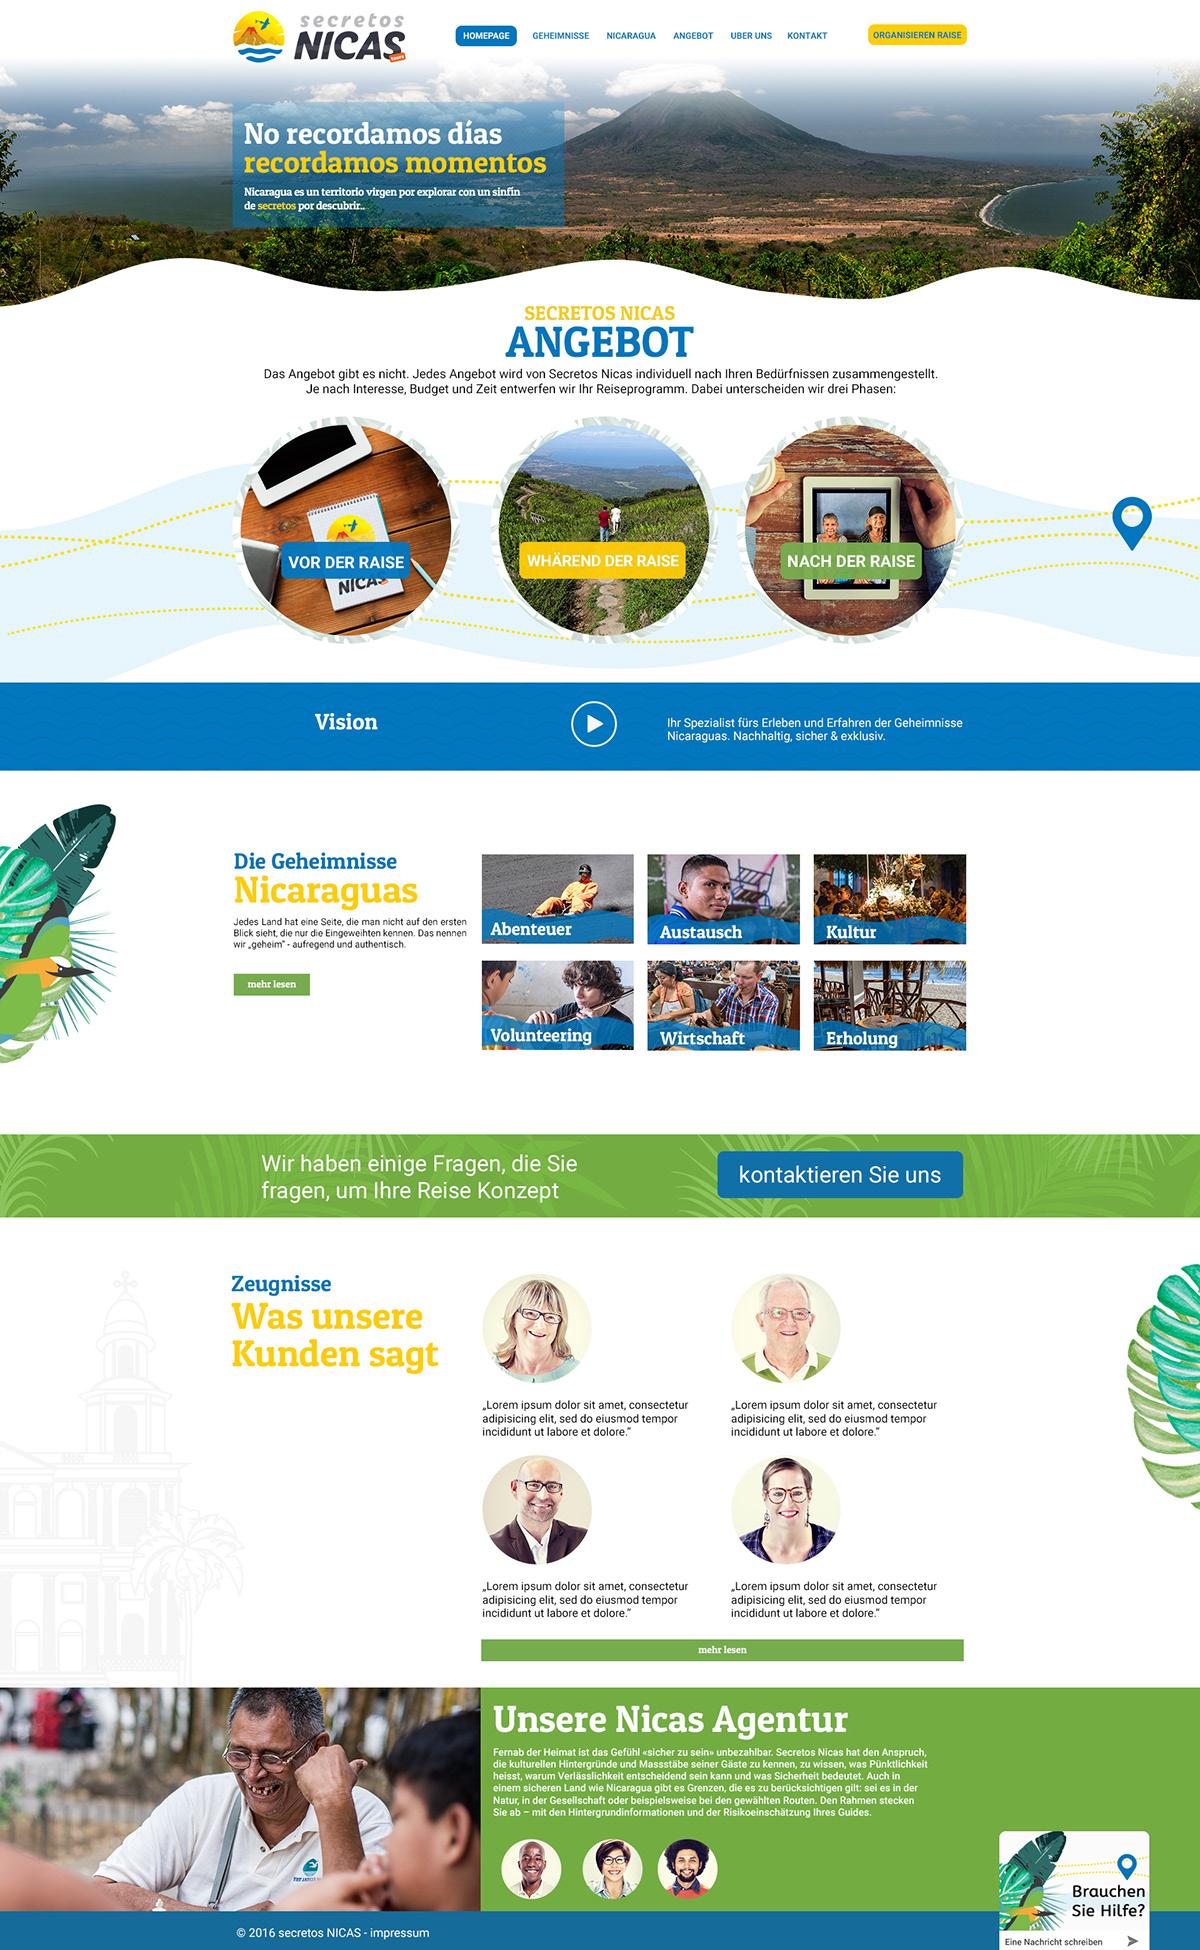 Corporate Identity ux/ui Web Design